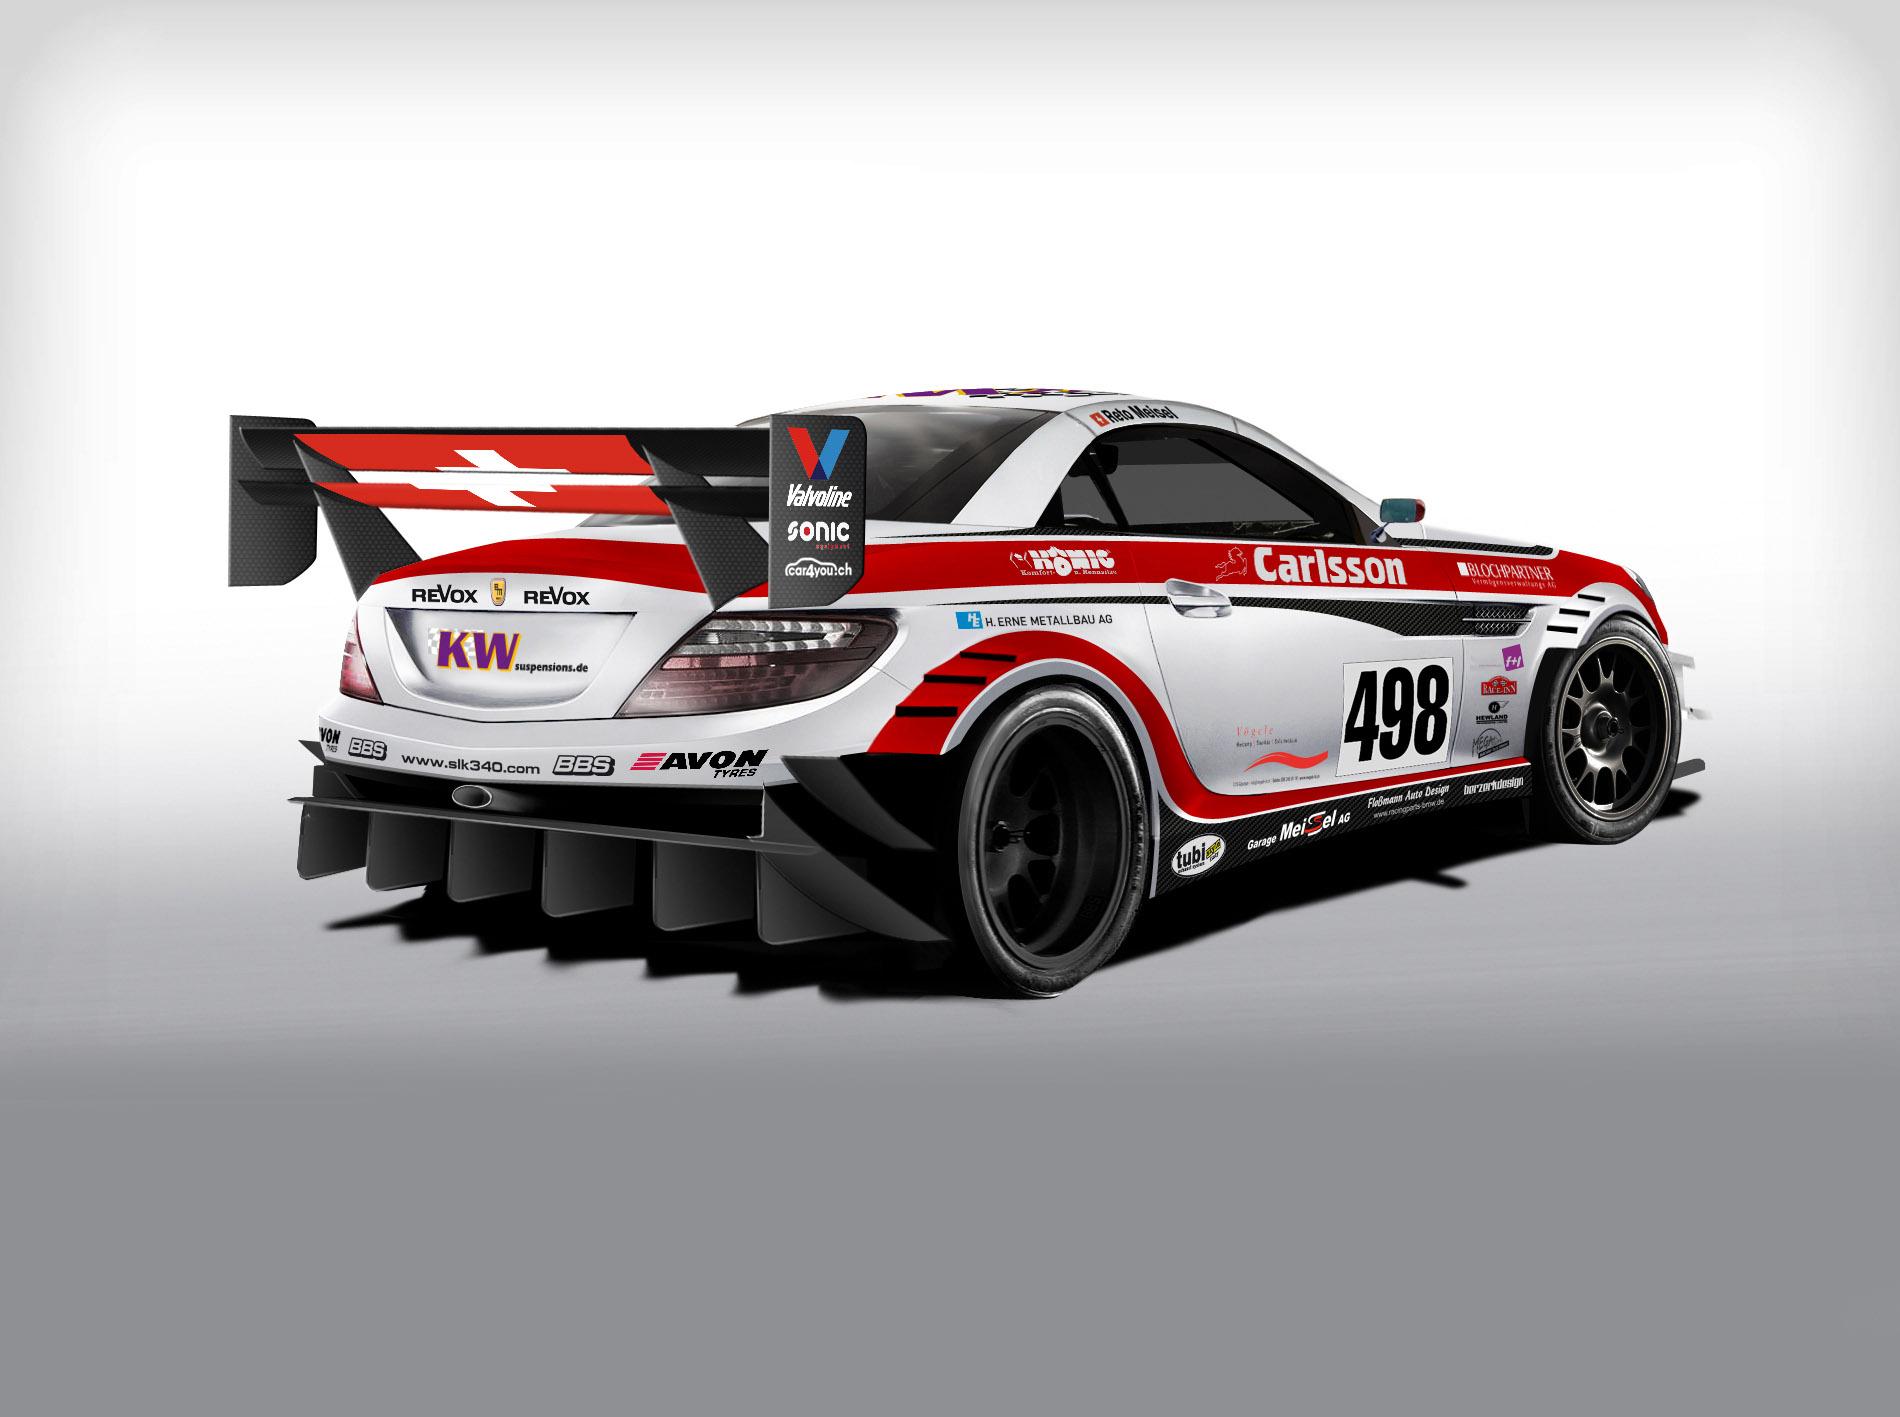 Carlsson Mercedes-Benz SLK Race Car - Picture 80199